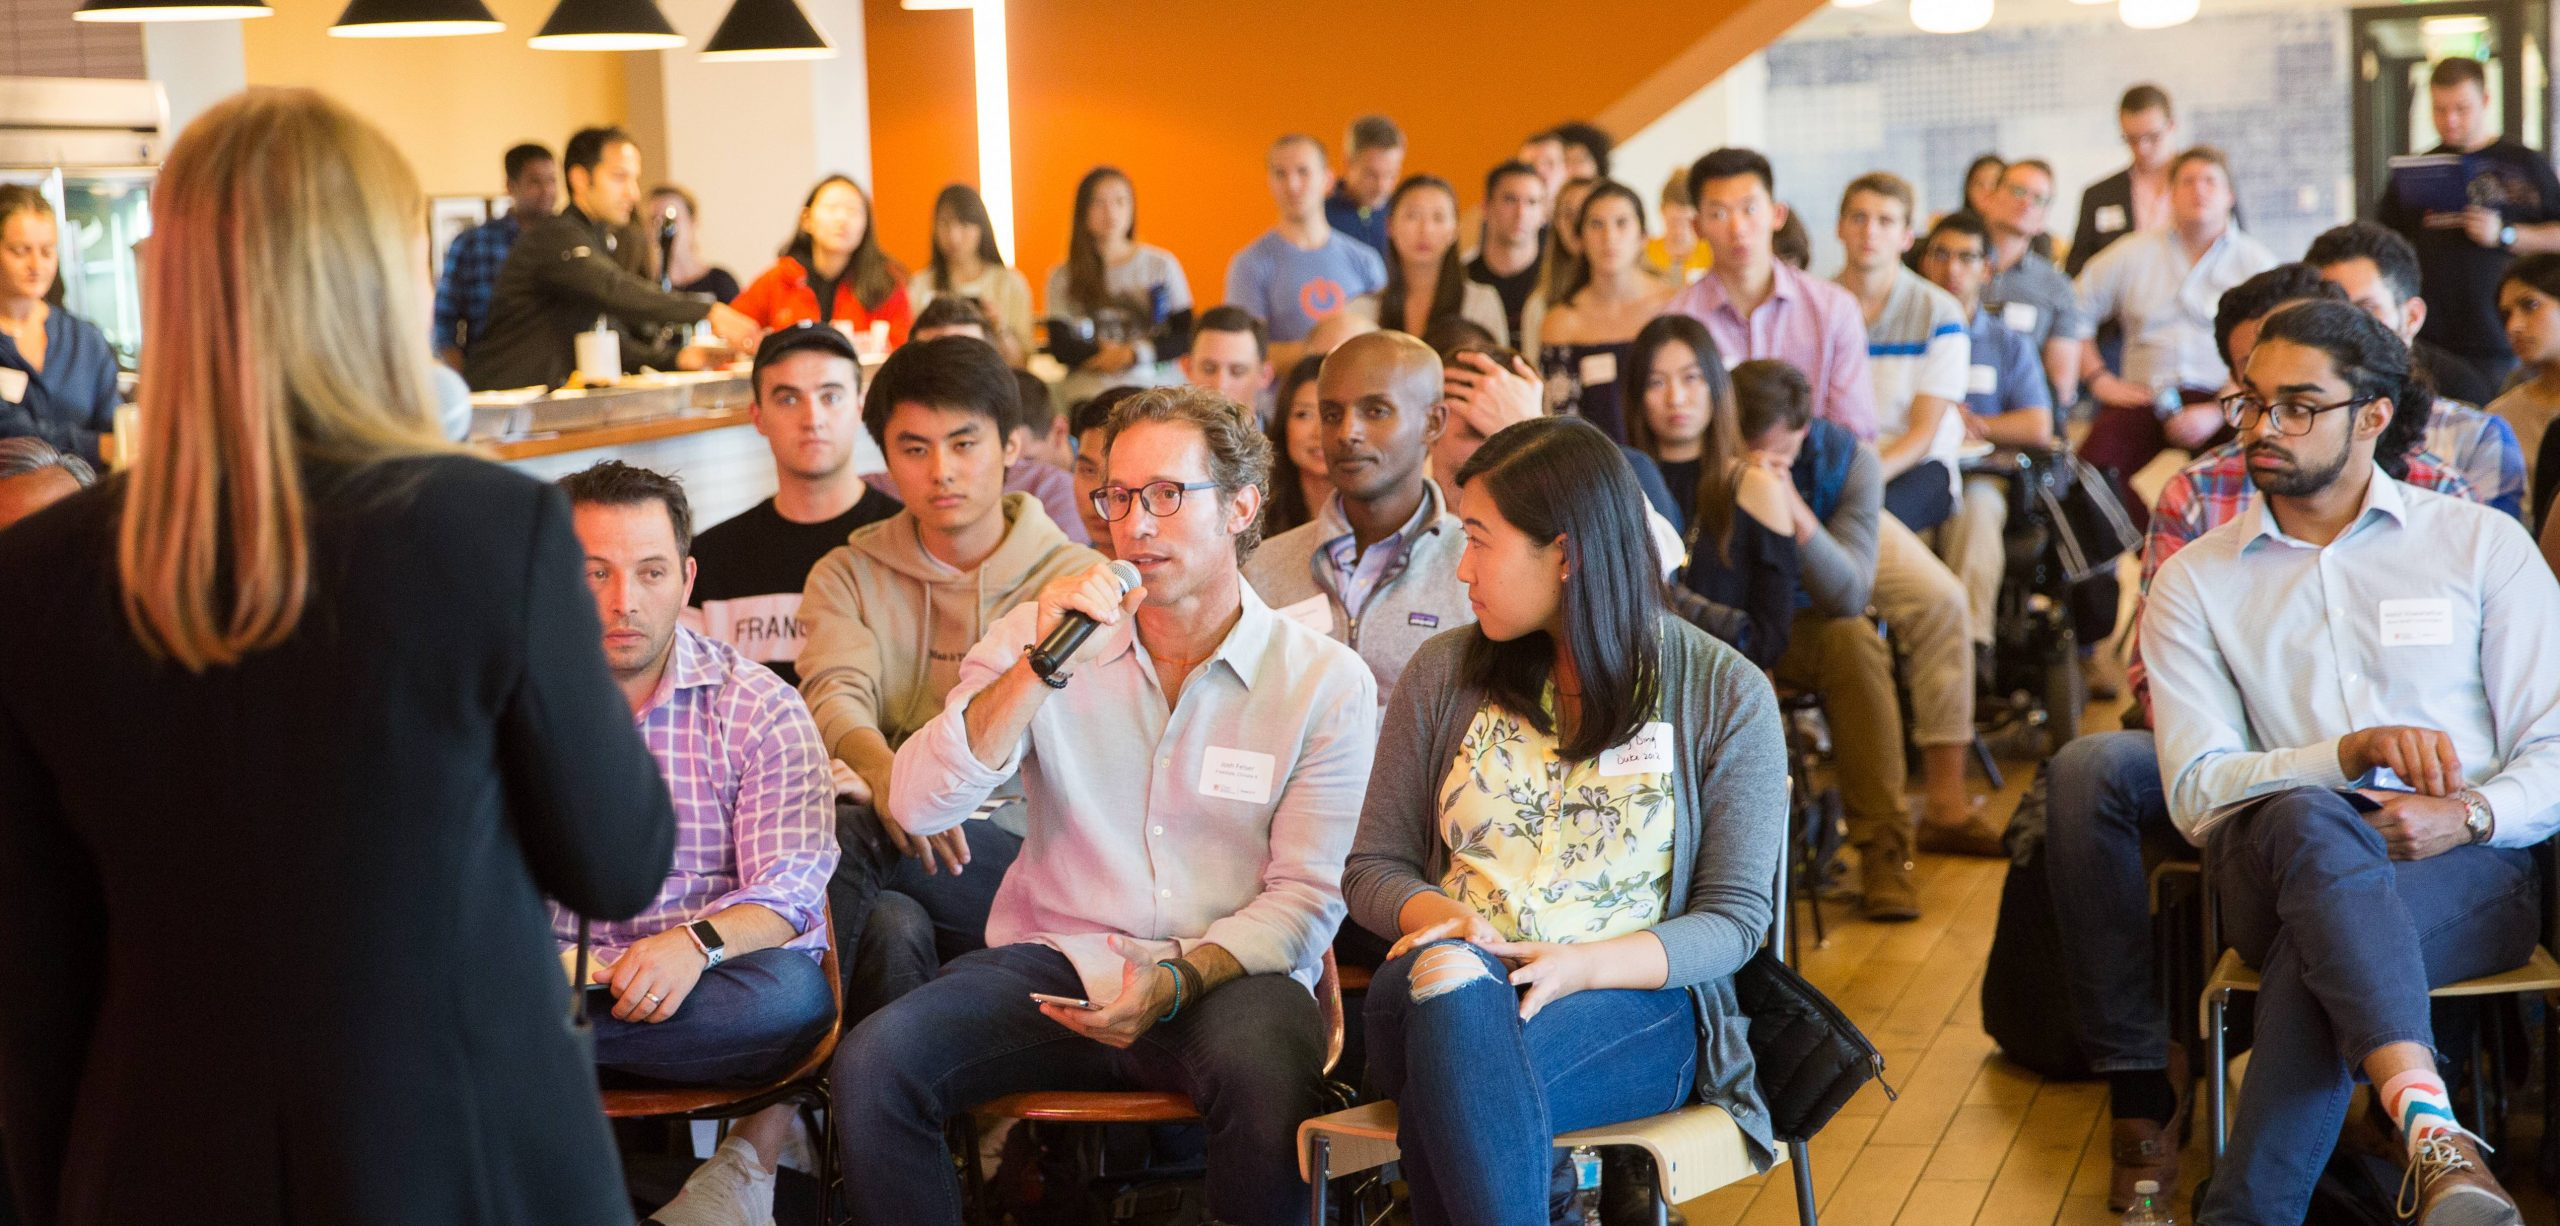 Conversation between event participants